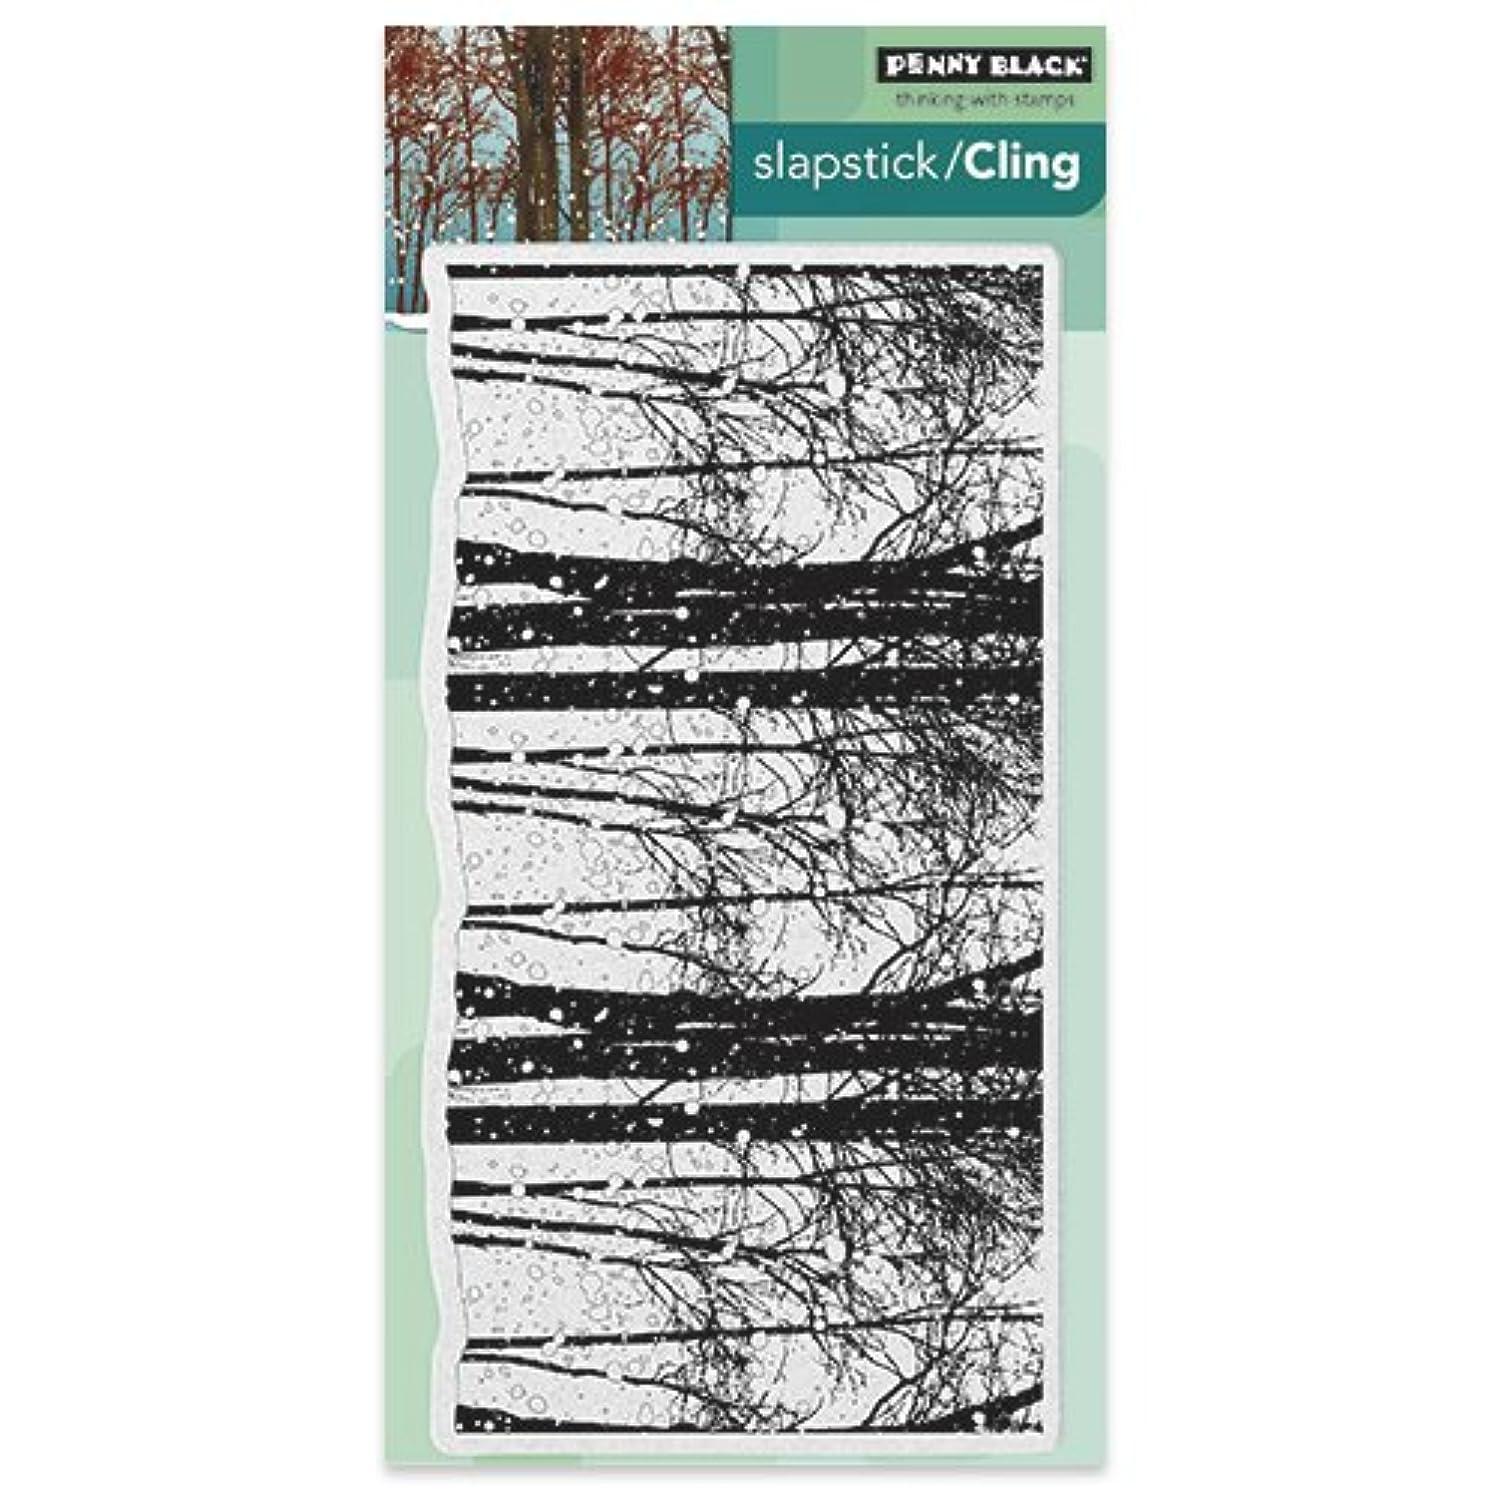 Penny Black 40-418 Snowy Grove Slapstick/Cling Decorative Rubber Stamp